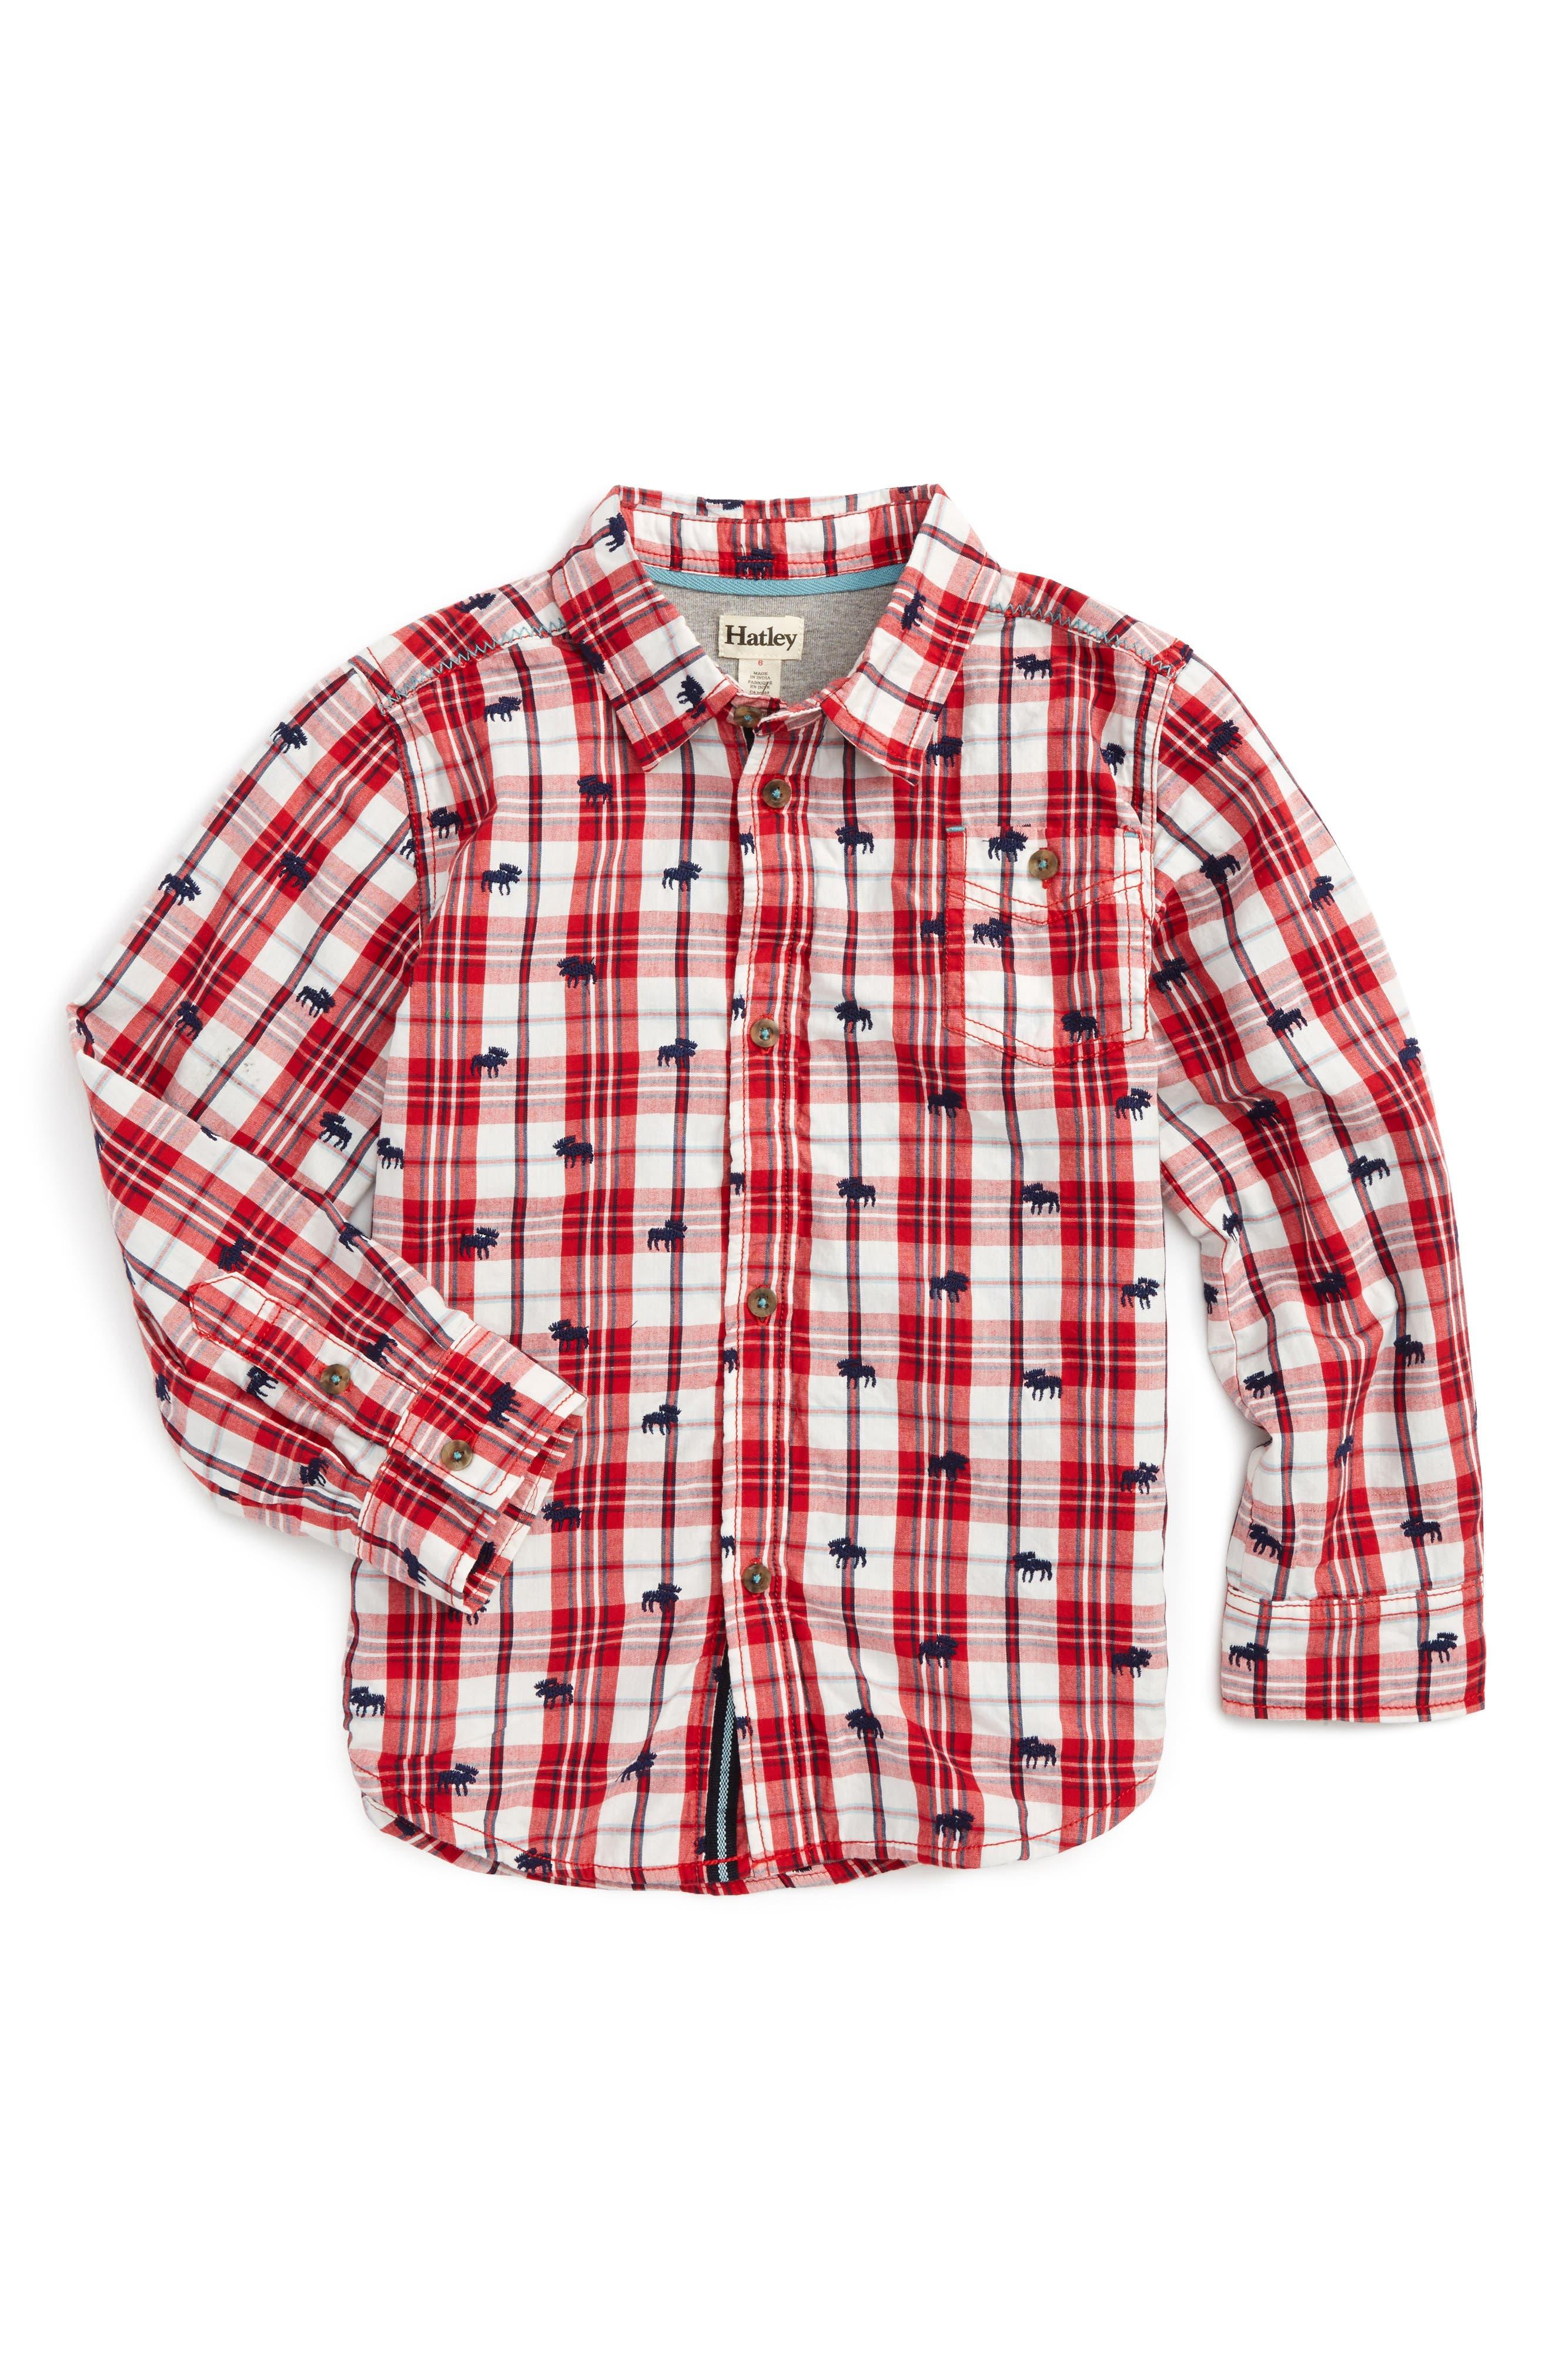 Hatley Embroidered Plaid Shirt (Toddler Boys, Little Boys & Big Boys)